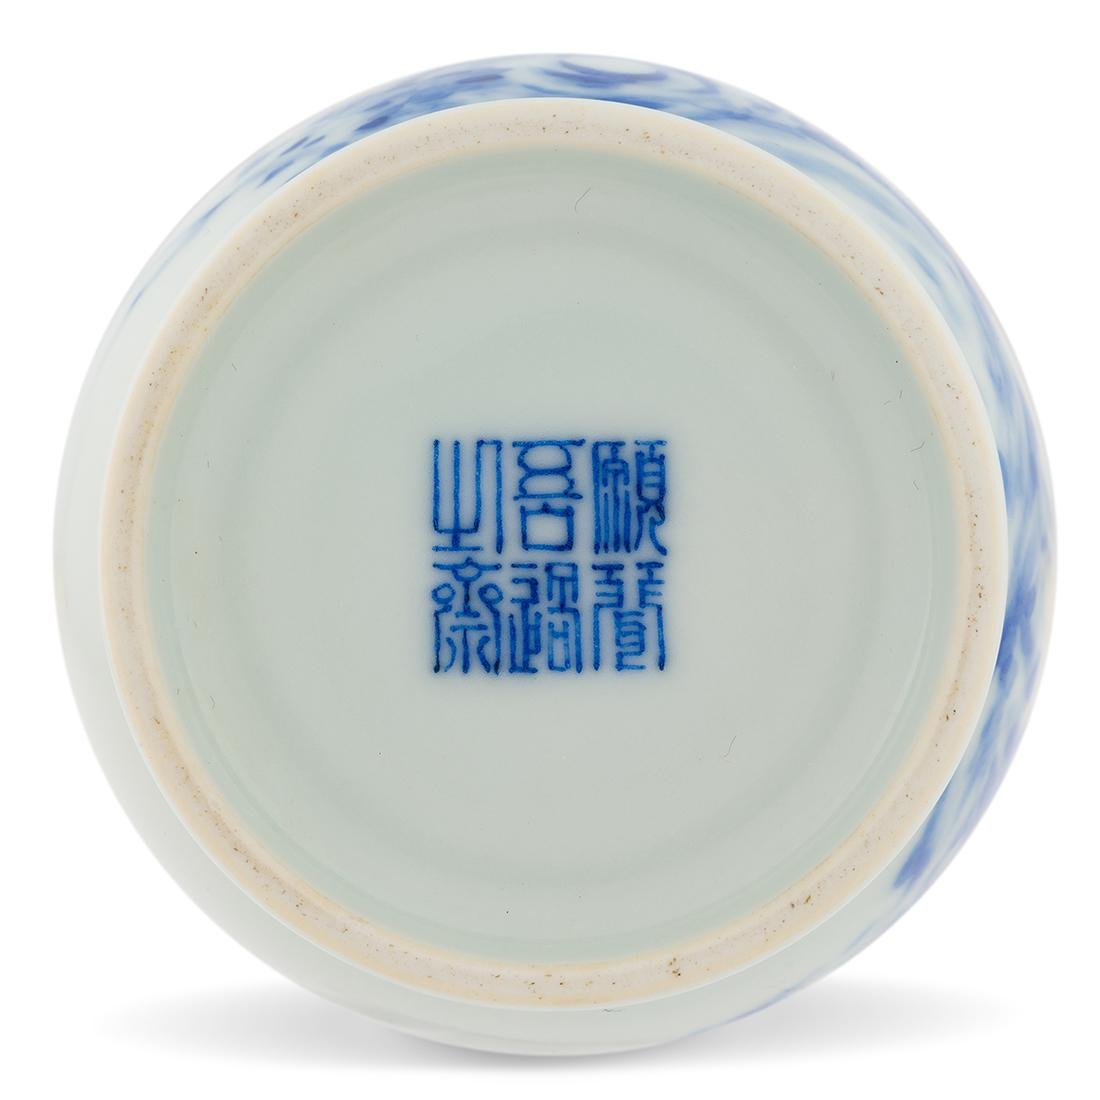 WANGBU BLUE & WHITE BIRD SMALL VASE - 2